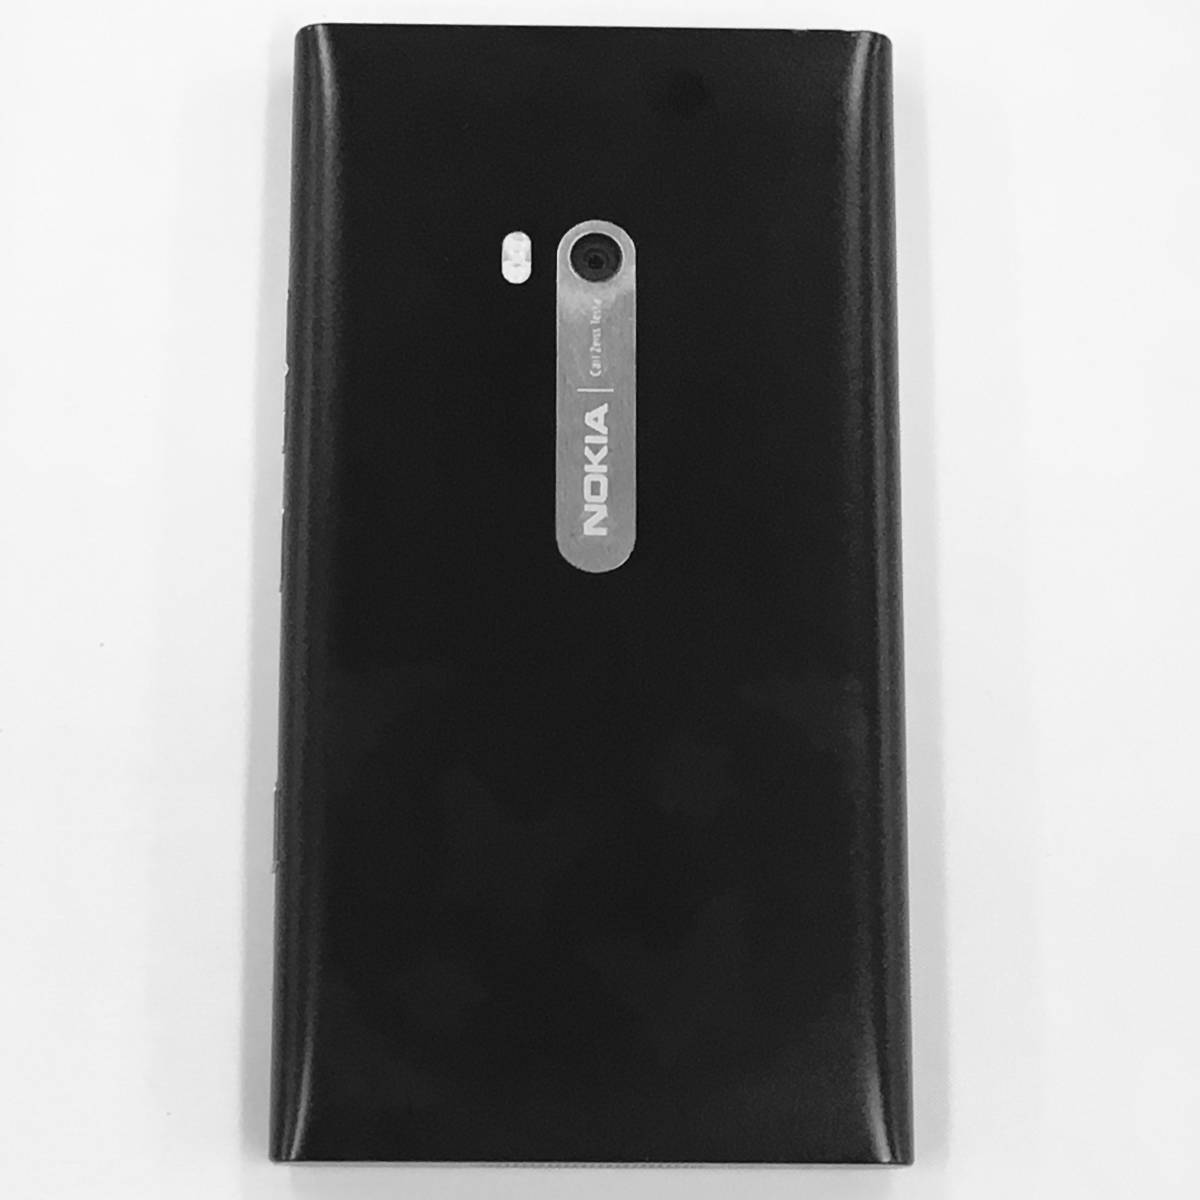 FP028977_(328)【送料無料】NOKIA/Lumia900/ブラック/16GB/Windows/スマートフォン/スマホ【中古】_画像4